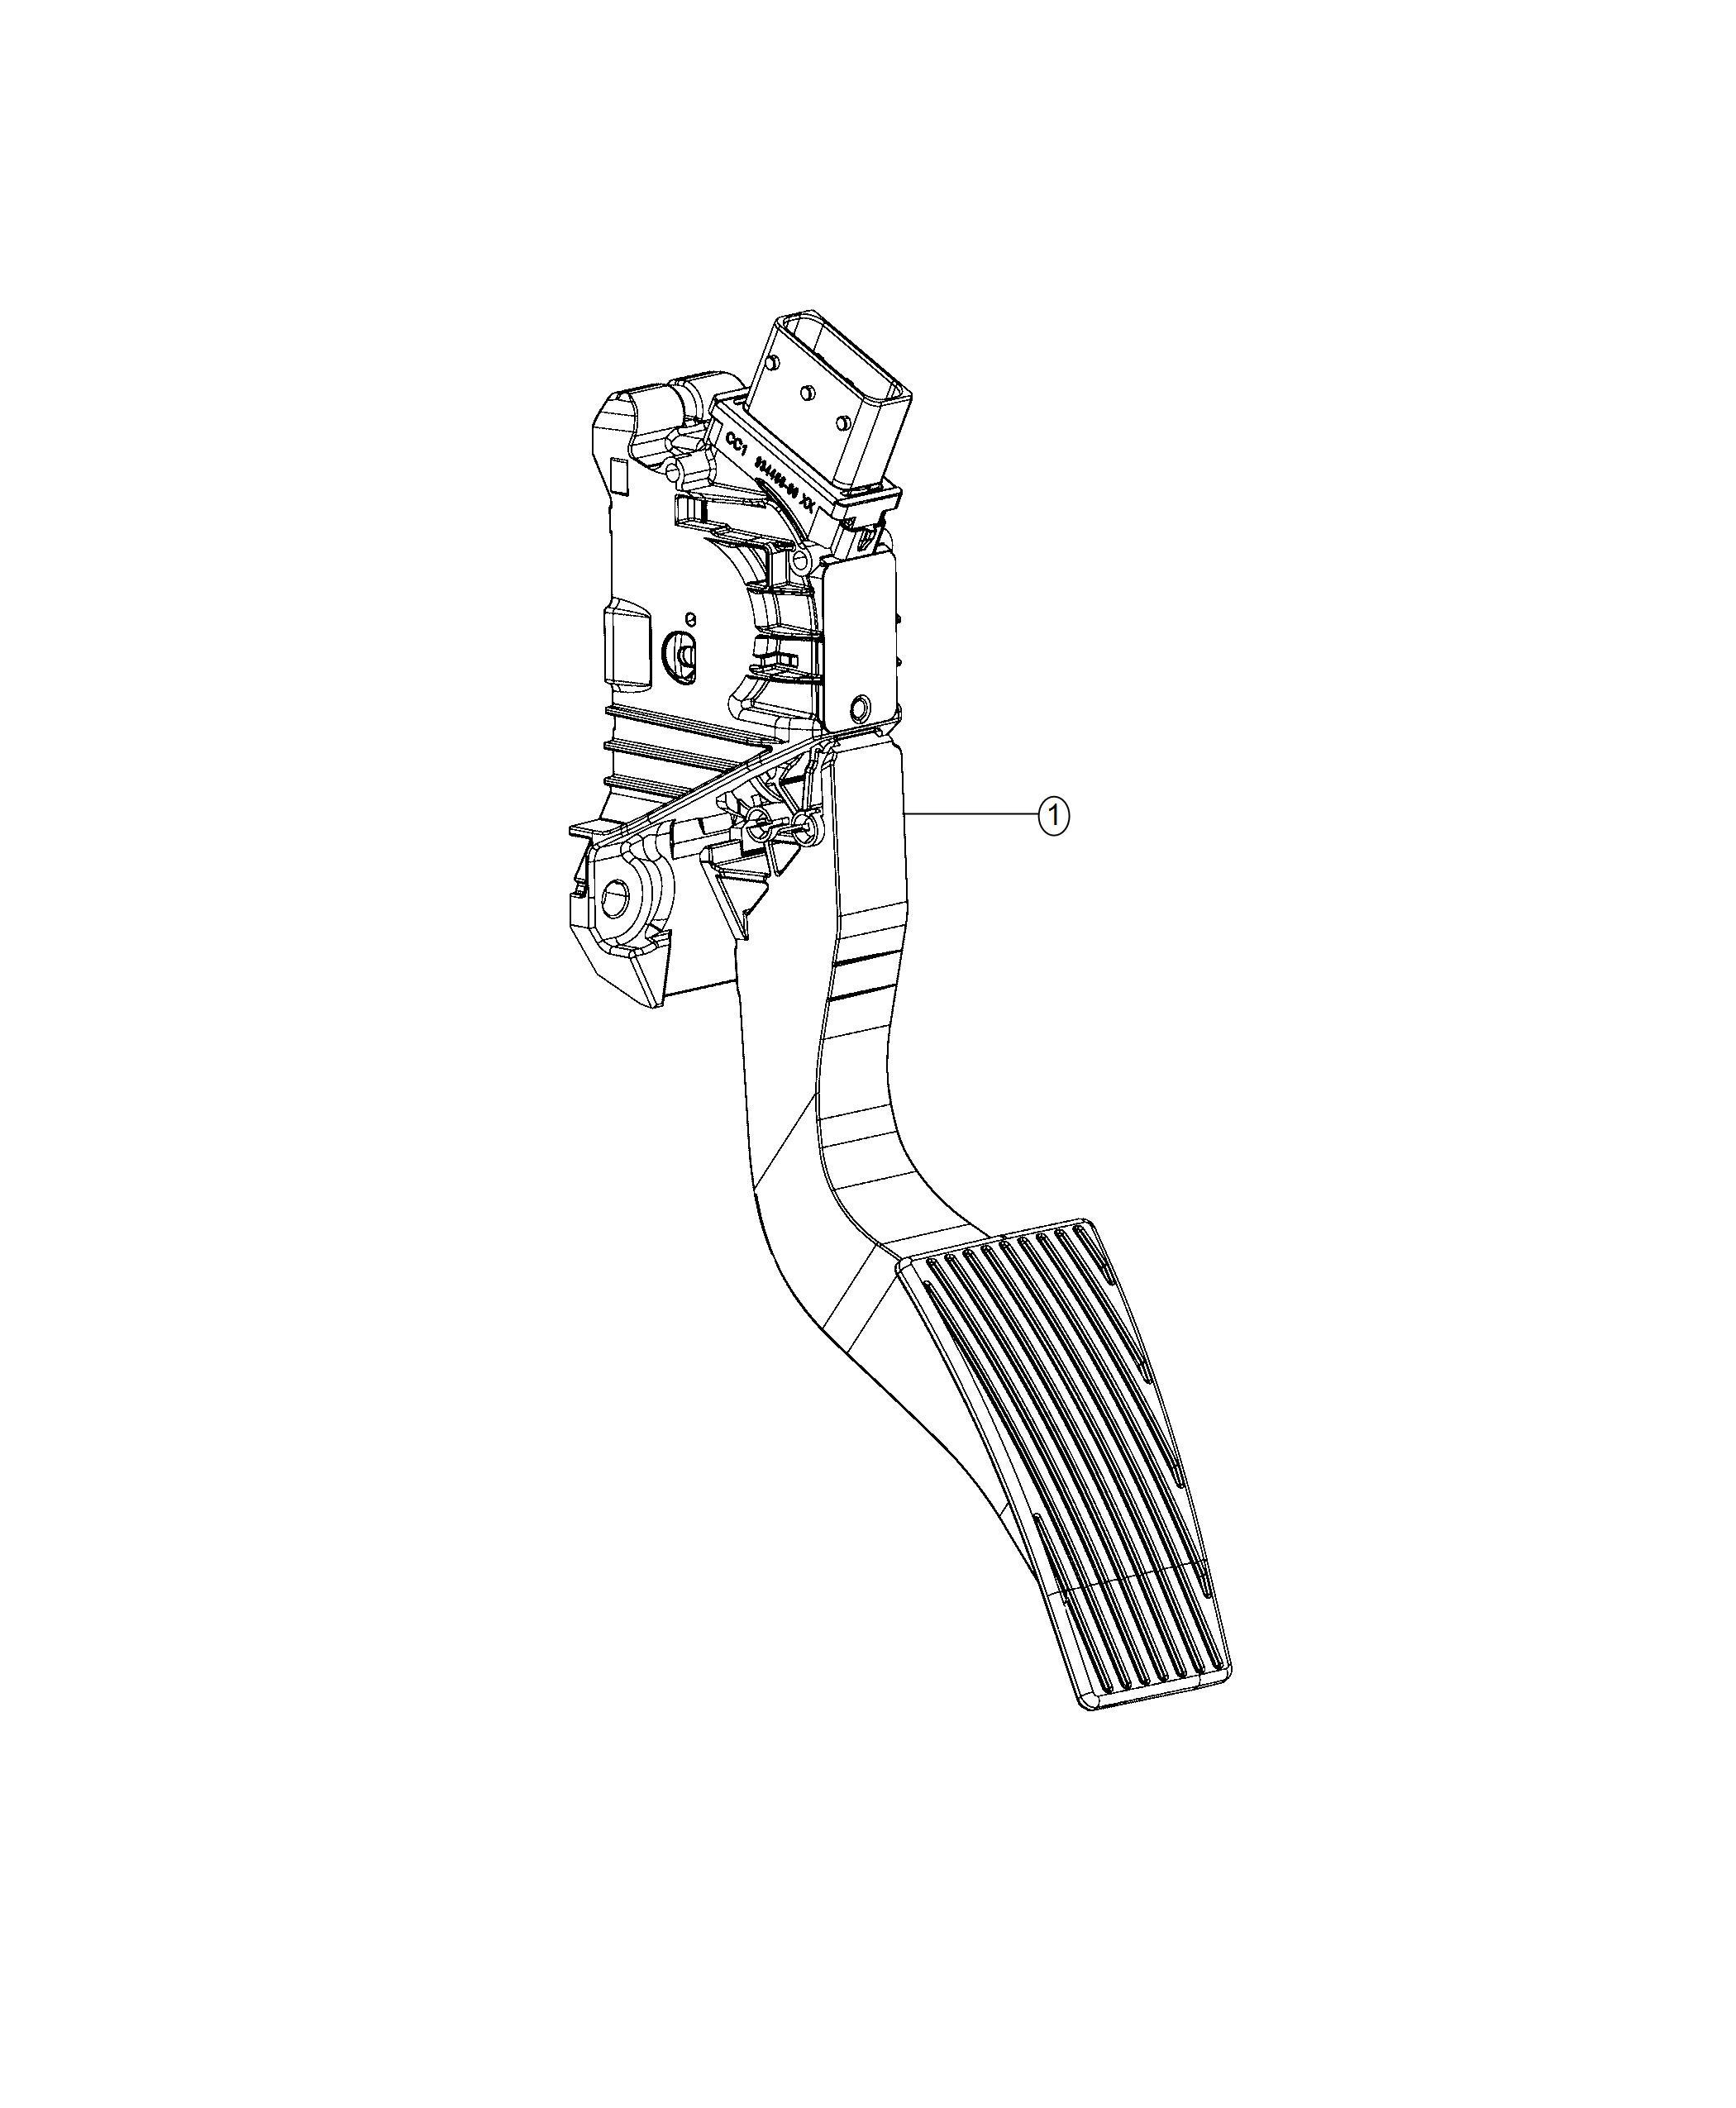 Ram Pedal Accelerator Non Adjustable Pedals